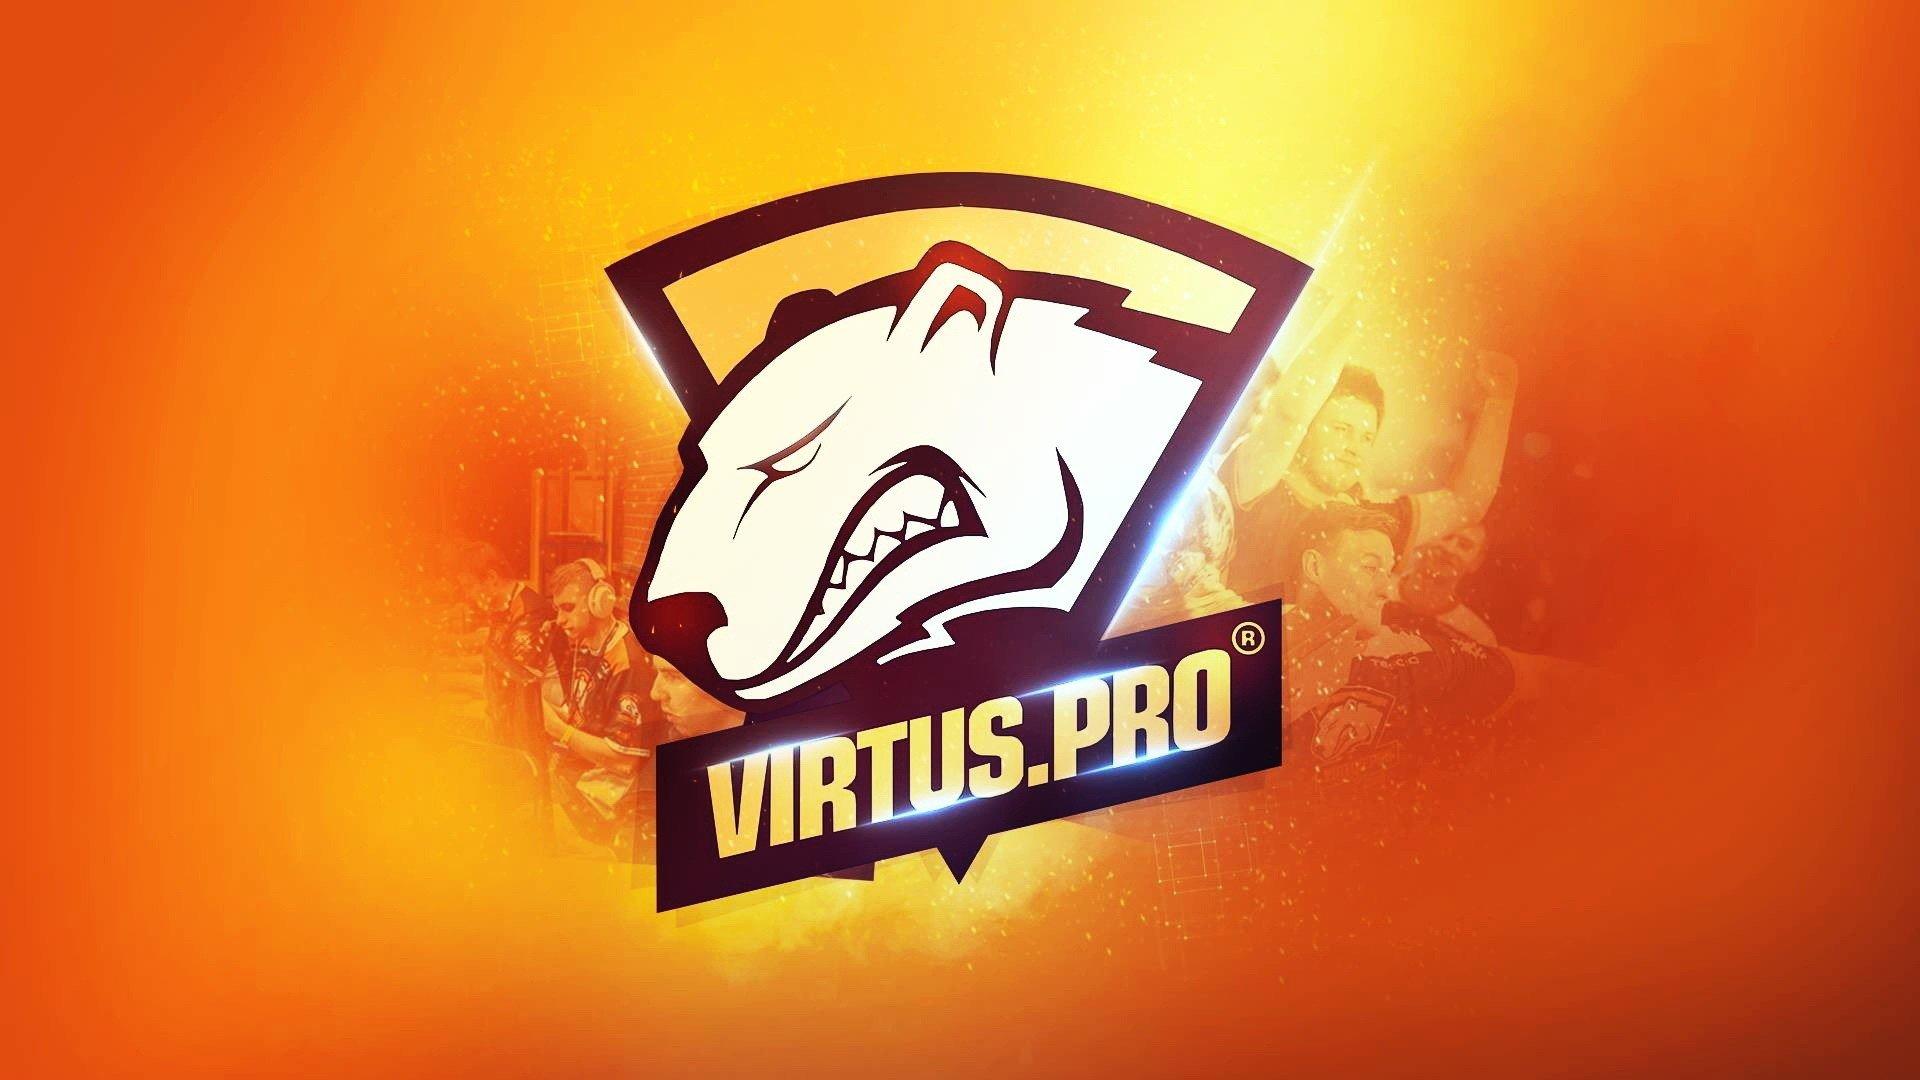 Virtuspro худшая команда по игре в форсбай раундах